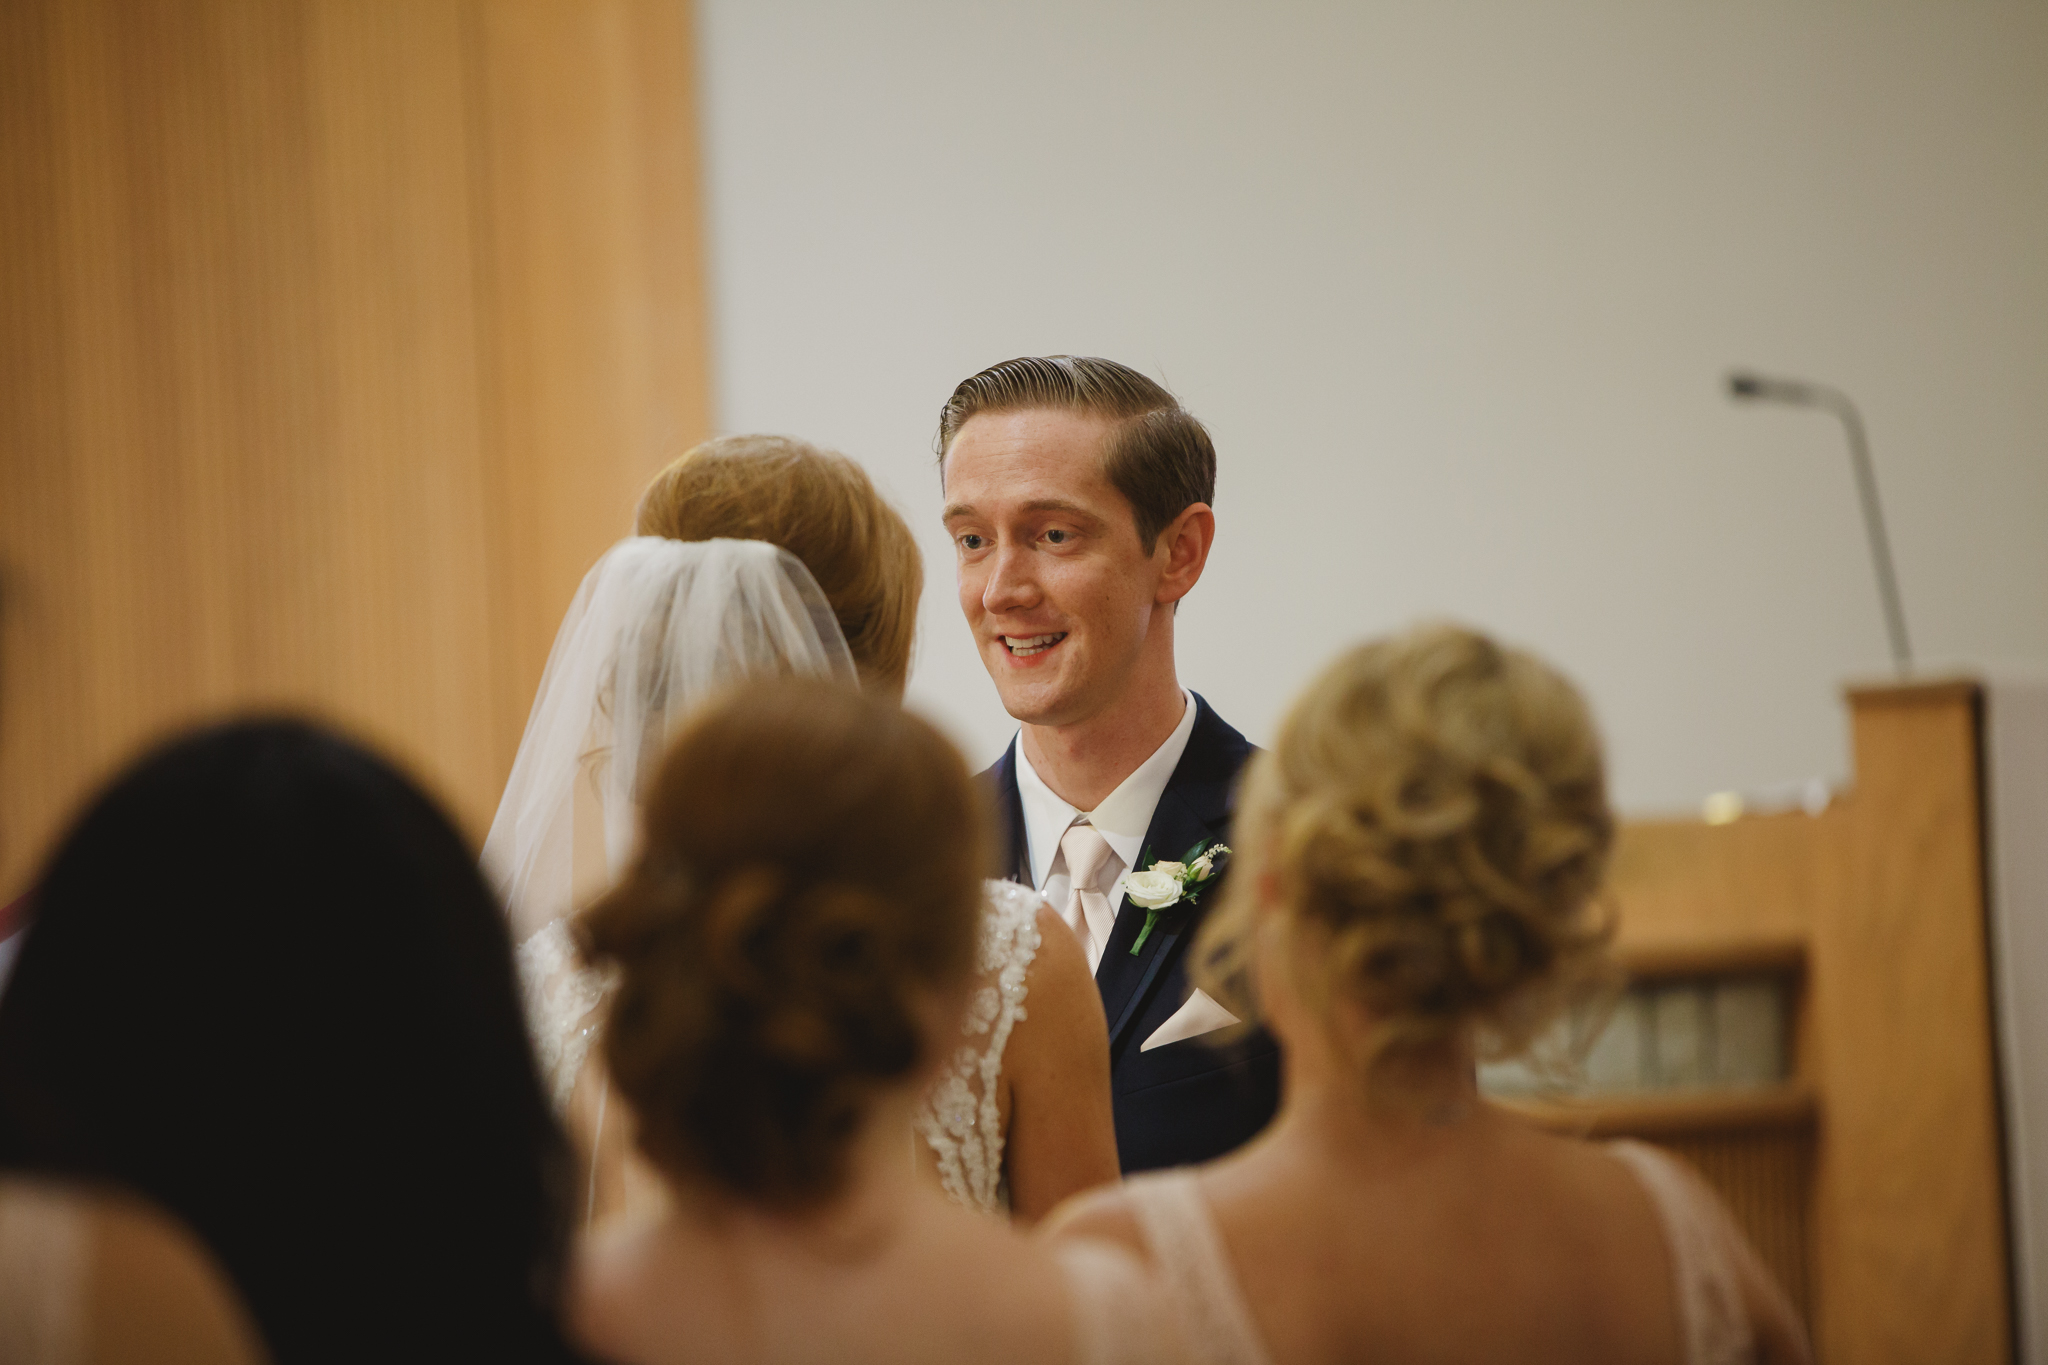 Michael and Kelly - the ashton depot - wedding DFW - wedding photographer- elizalde photography (45 of 150).jpg